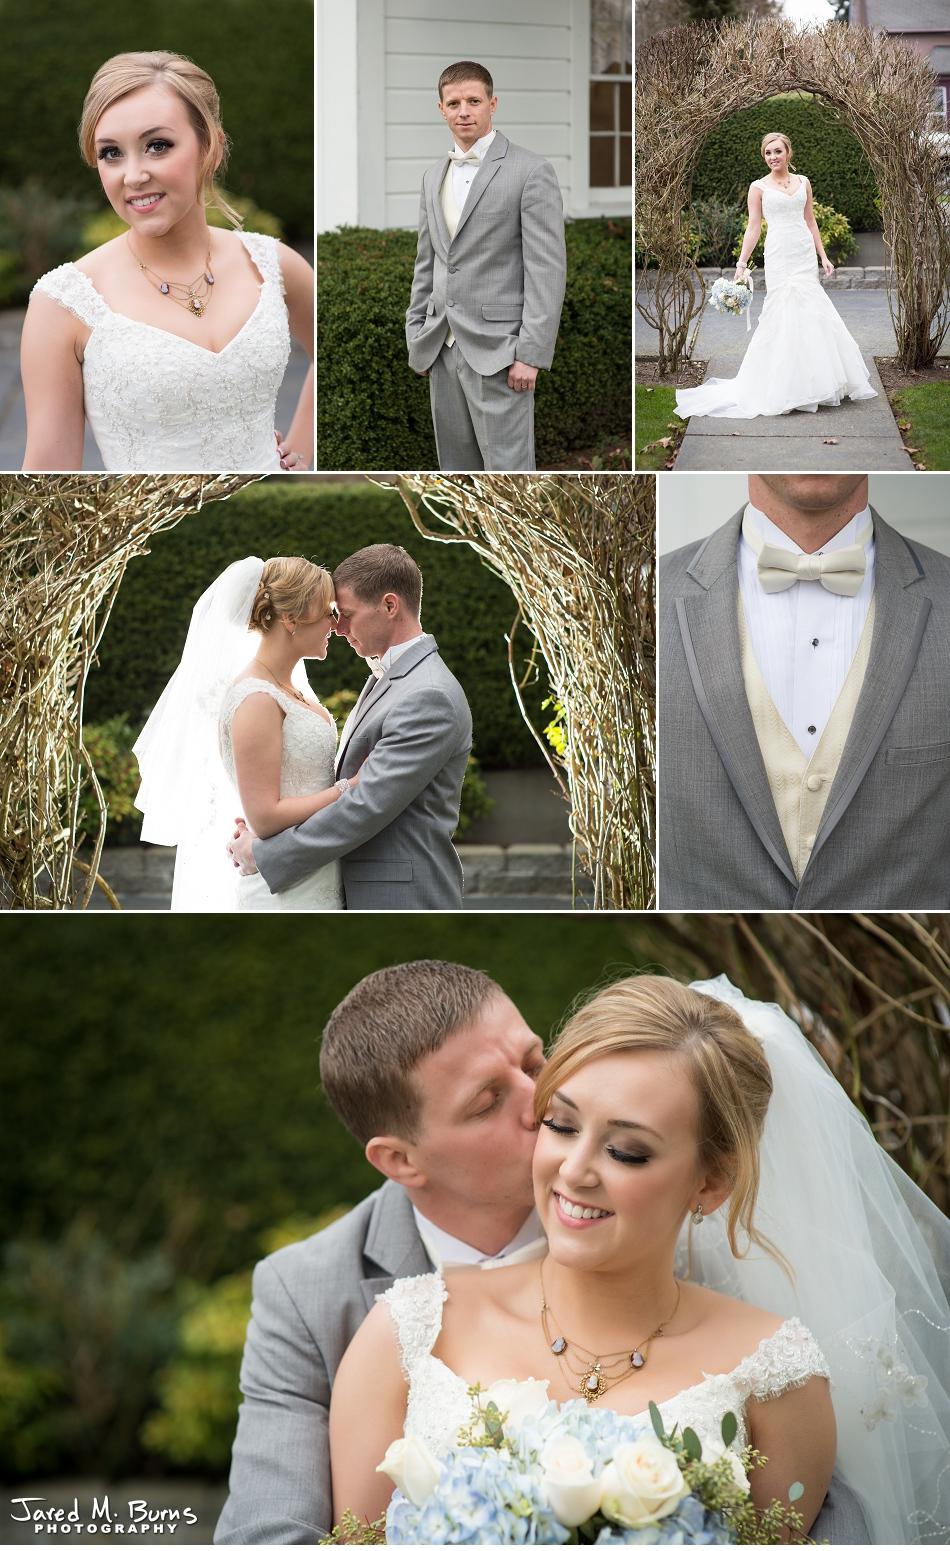 Belle Chapel Wedding Photographer, Snohomish, WA - Jared M. Burns (2)